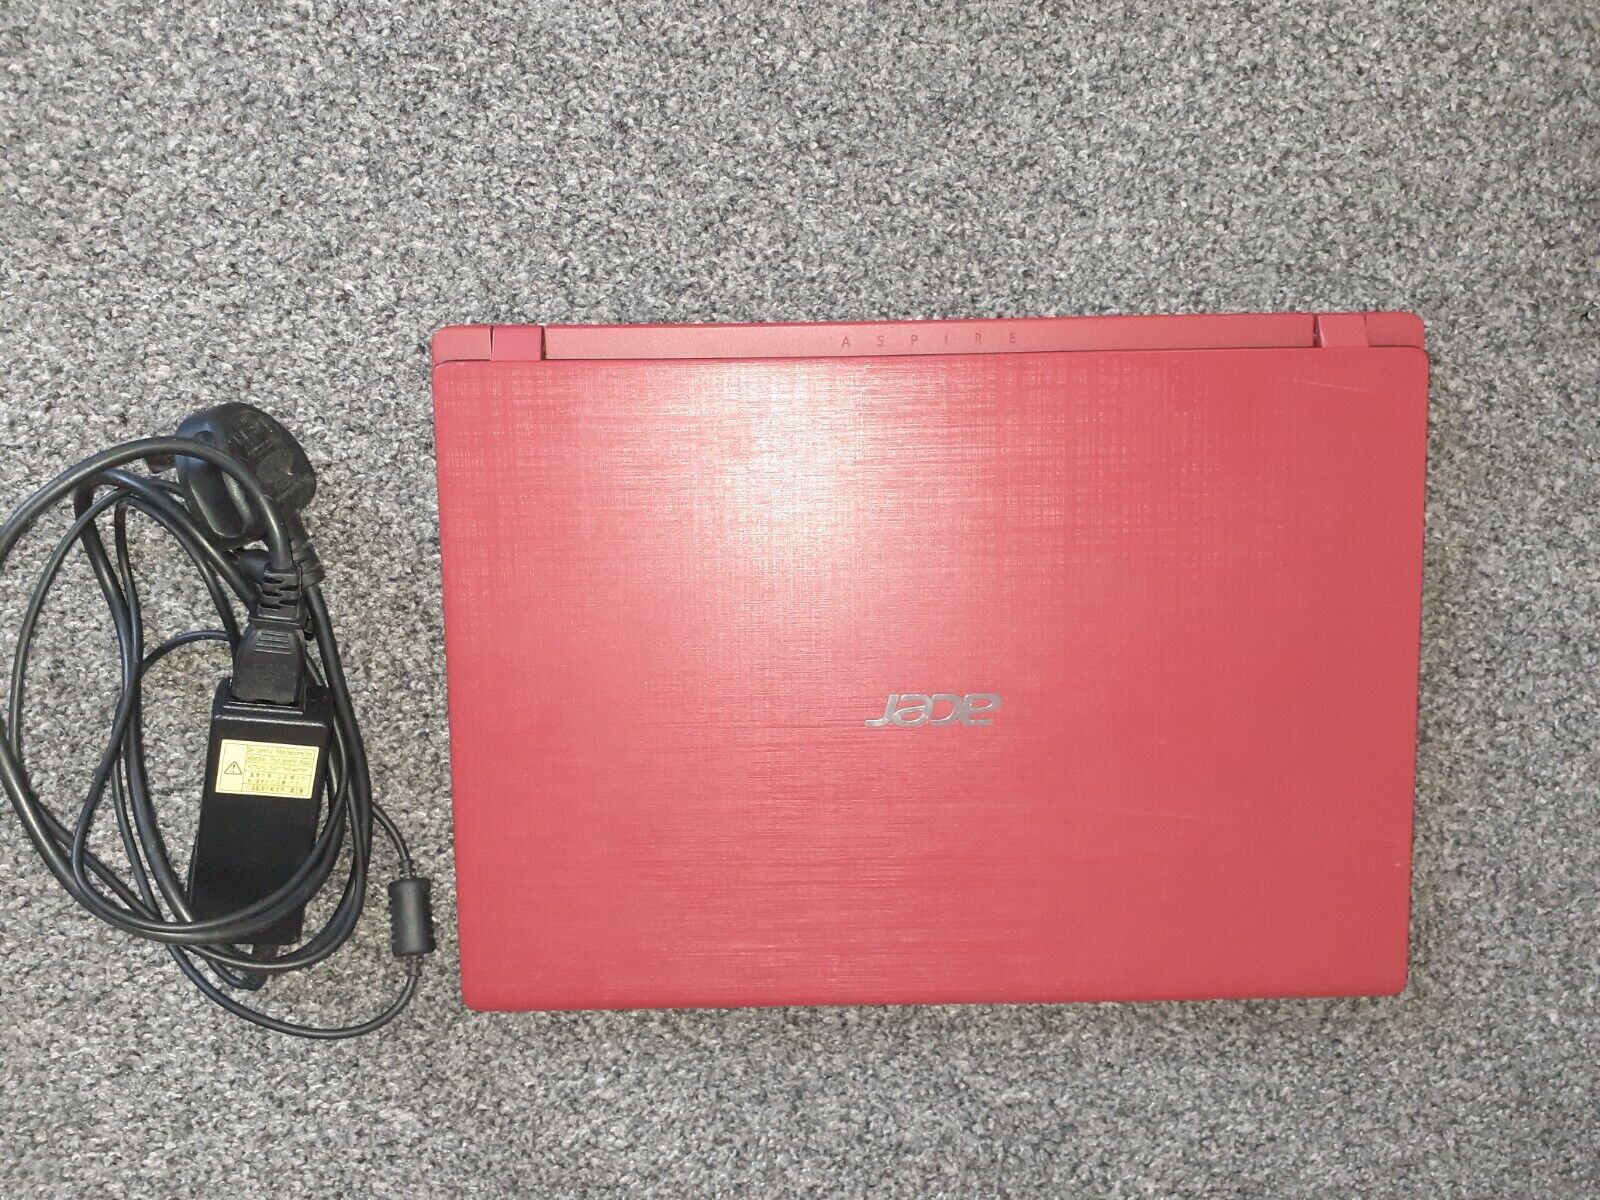 Laptop Windows - acer windows 10 s laptop. Processor N3350, HD Graphics,4 GB DDR3L Memory, red .